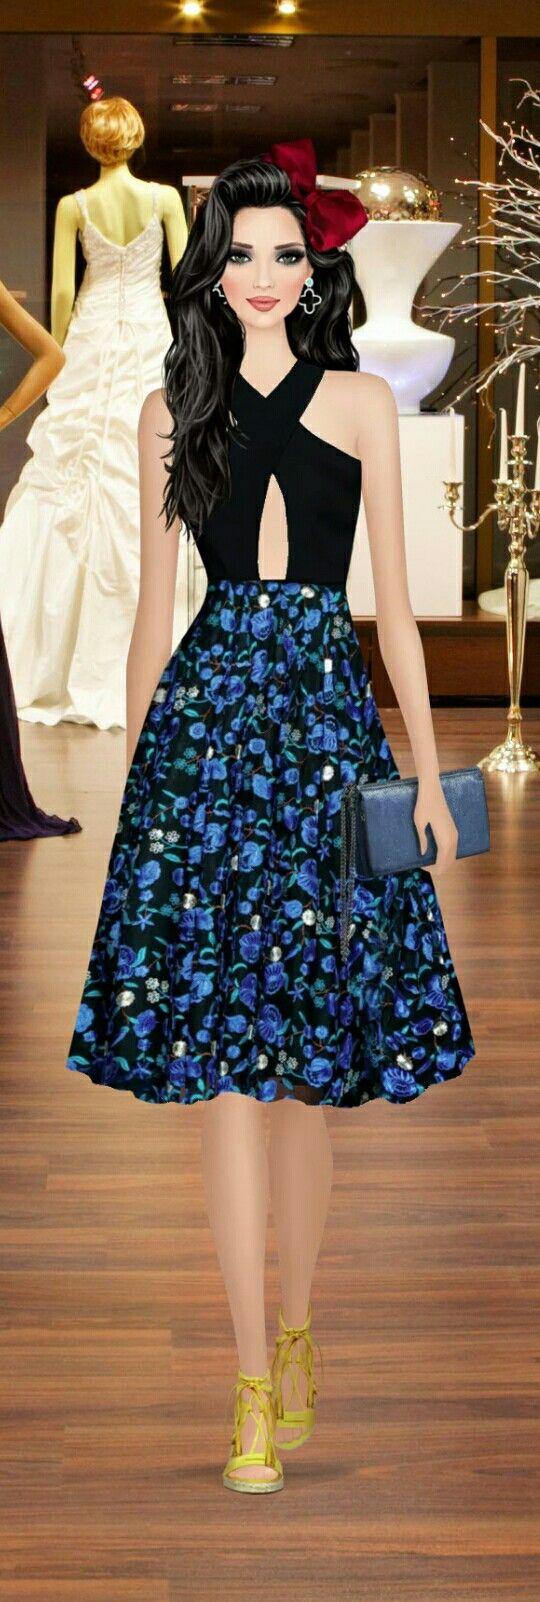 Shopping For Red Carpet Gown Take 2 Covet Fashion Covet Fashion